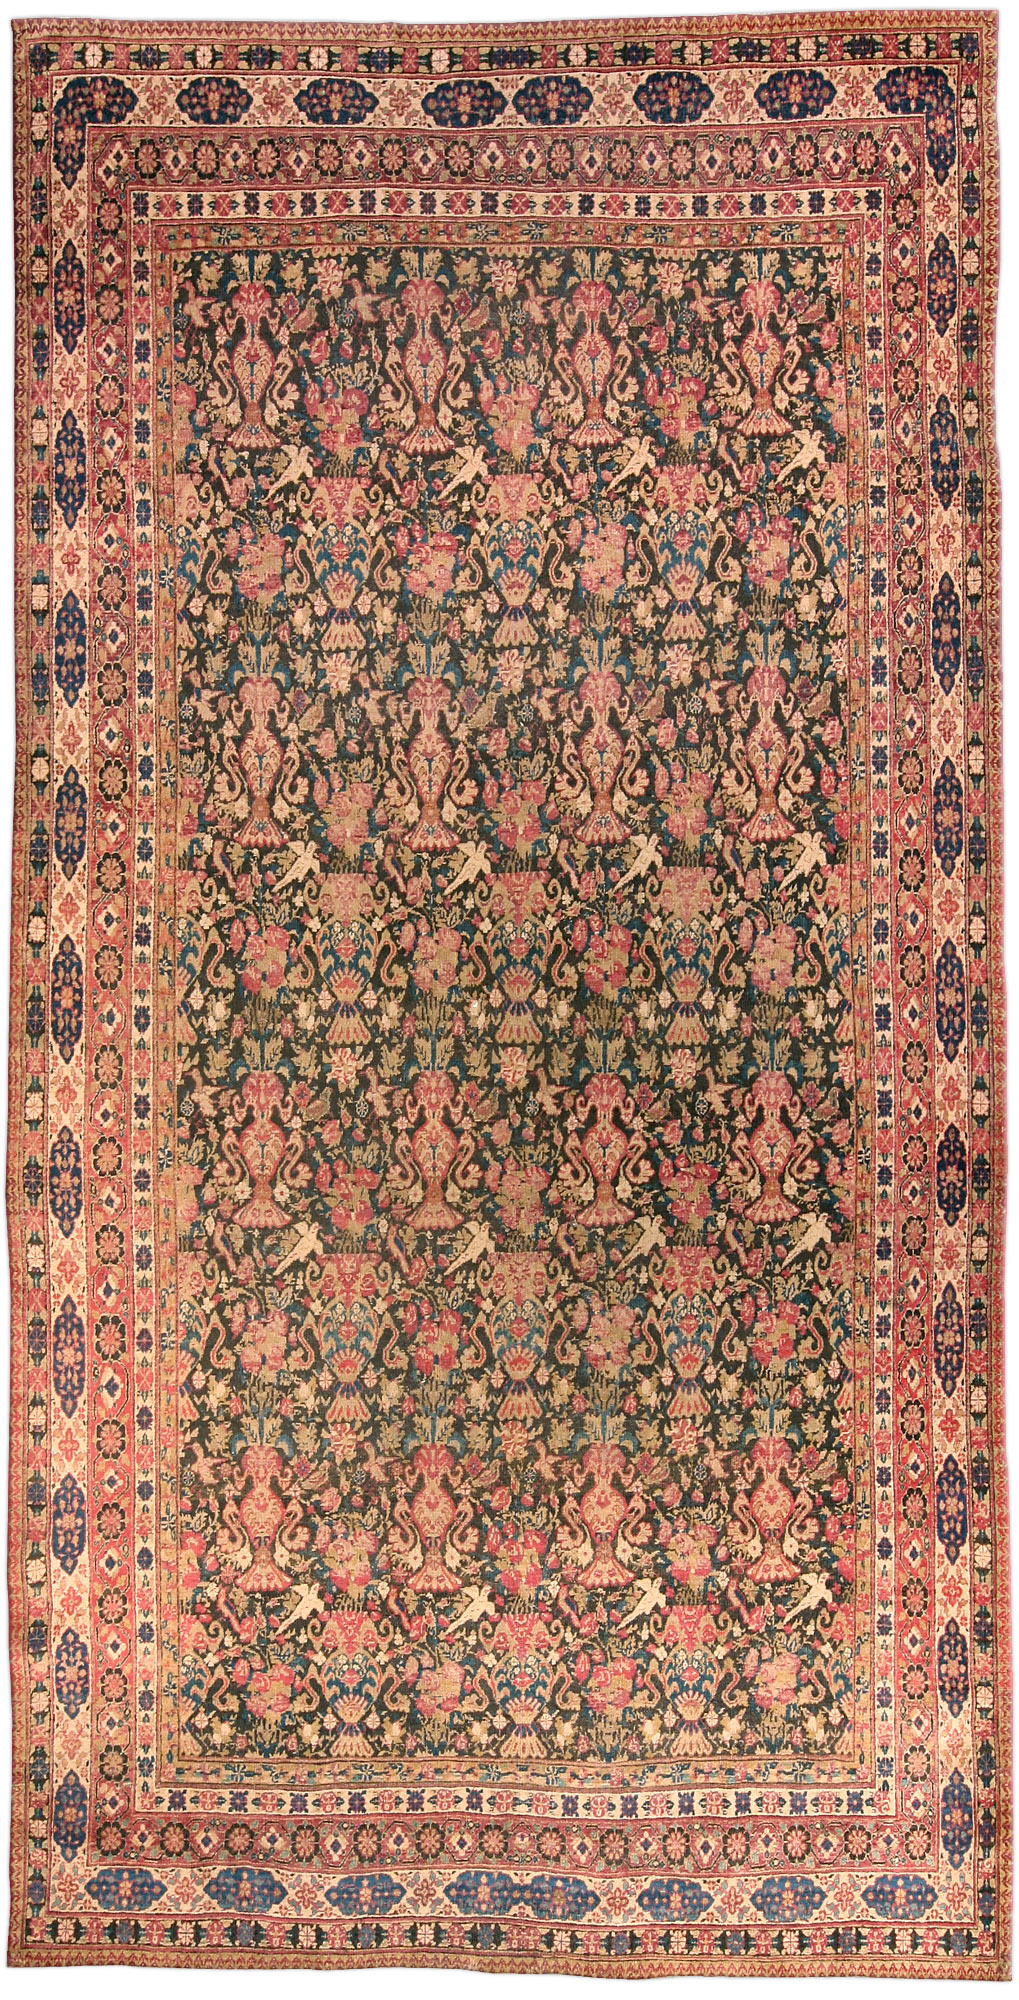 Antique Persian Kirman Carpet BB4584